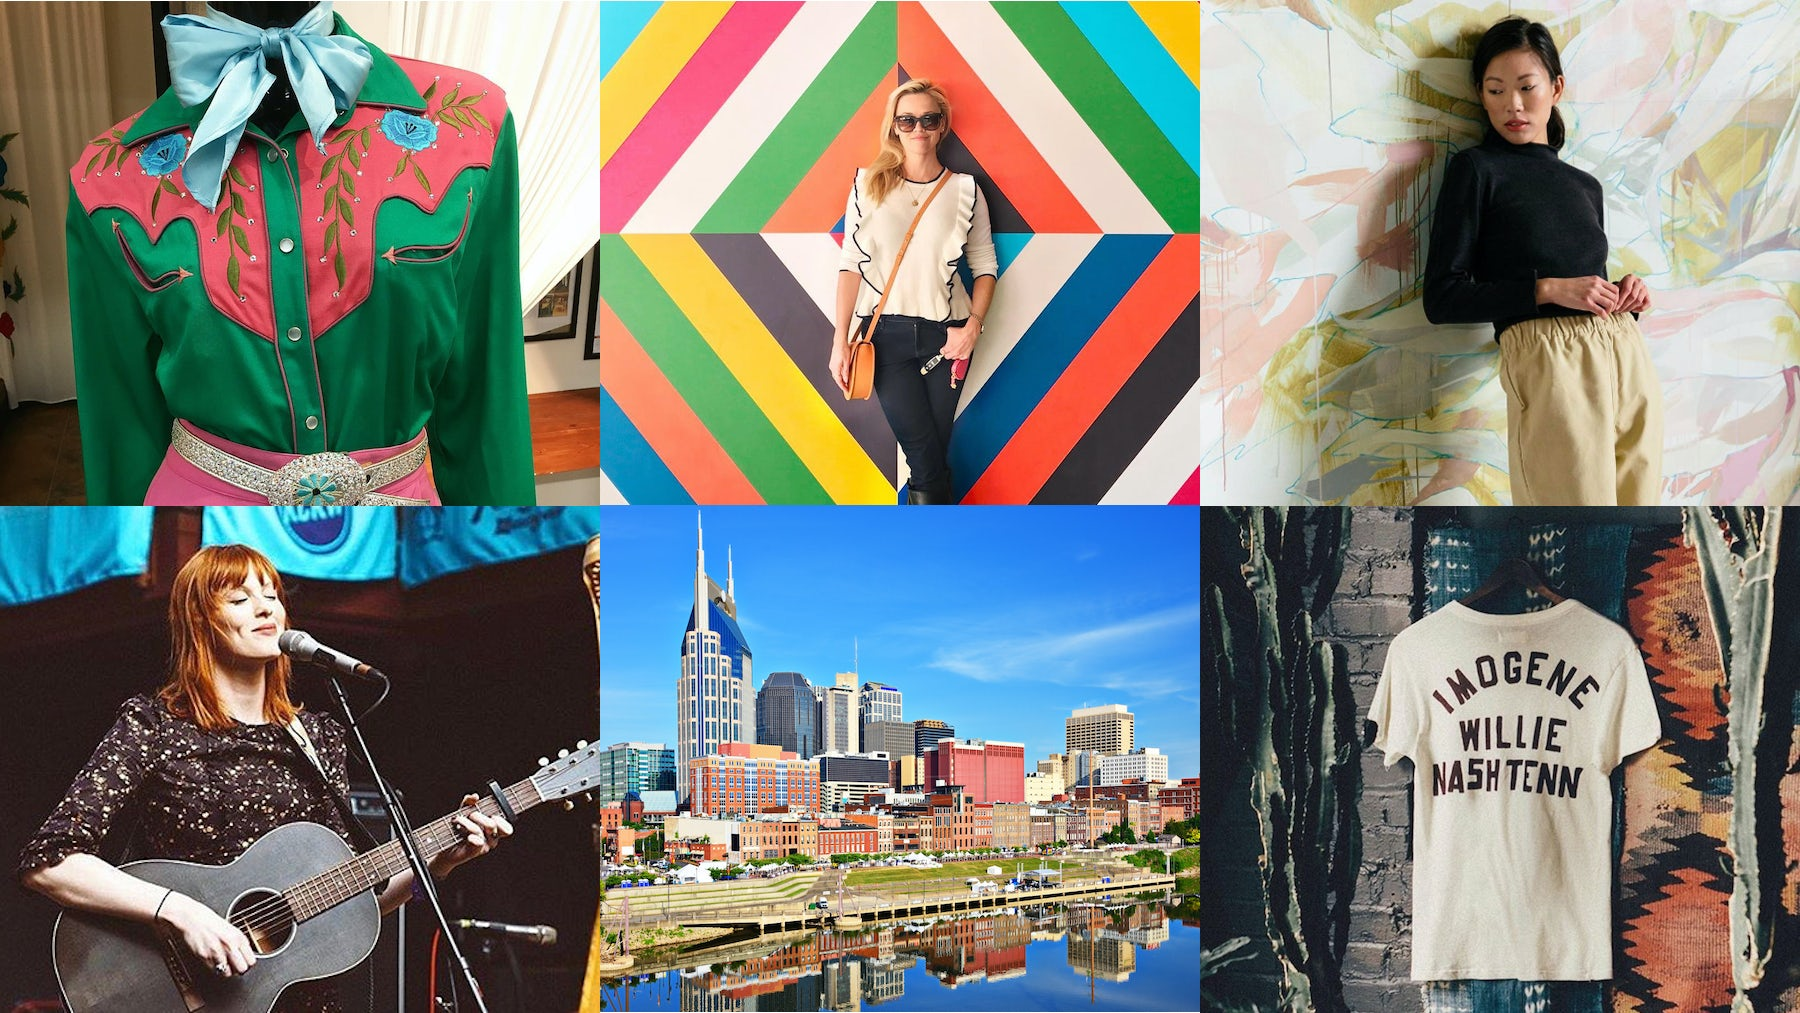 Nashville: America's Next Fashion Capital?